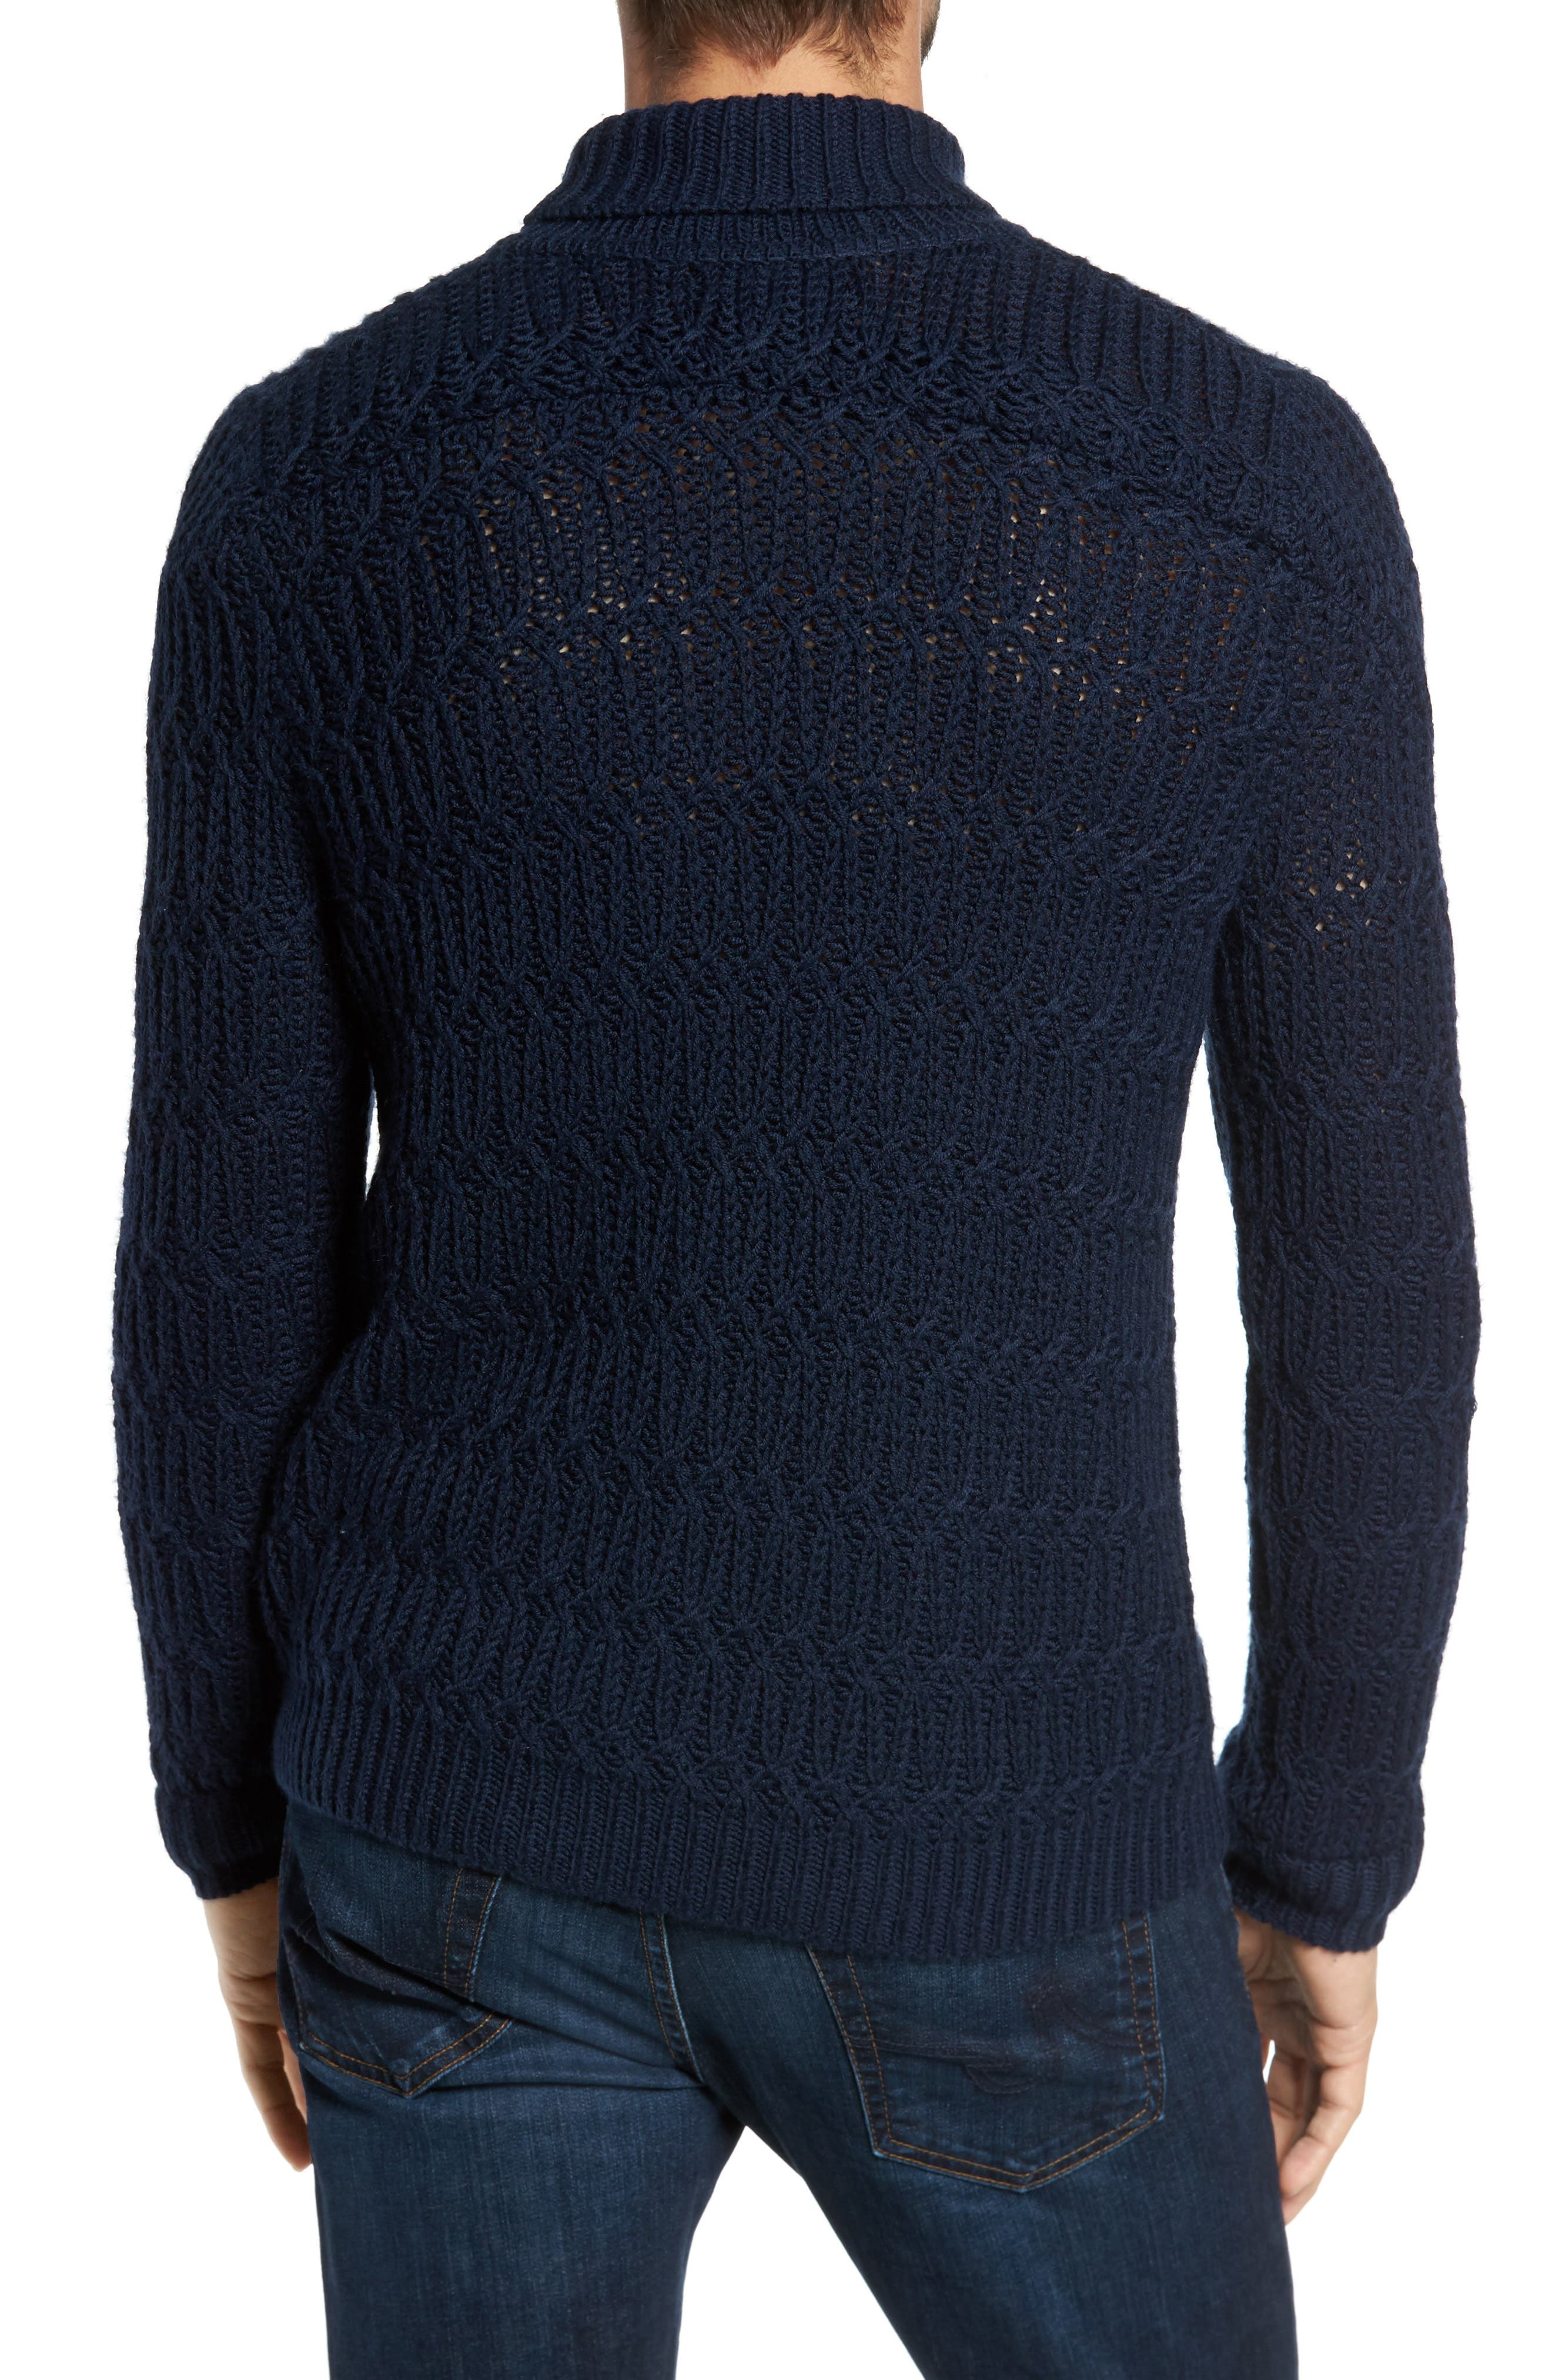 Chunky Turtleneck Sweater,                             Alternate thumbnail 4, color,                             Navy Iris